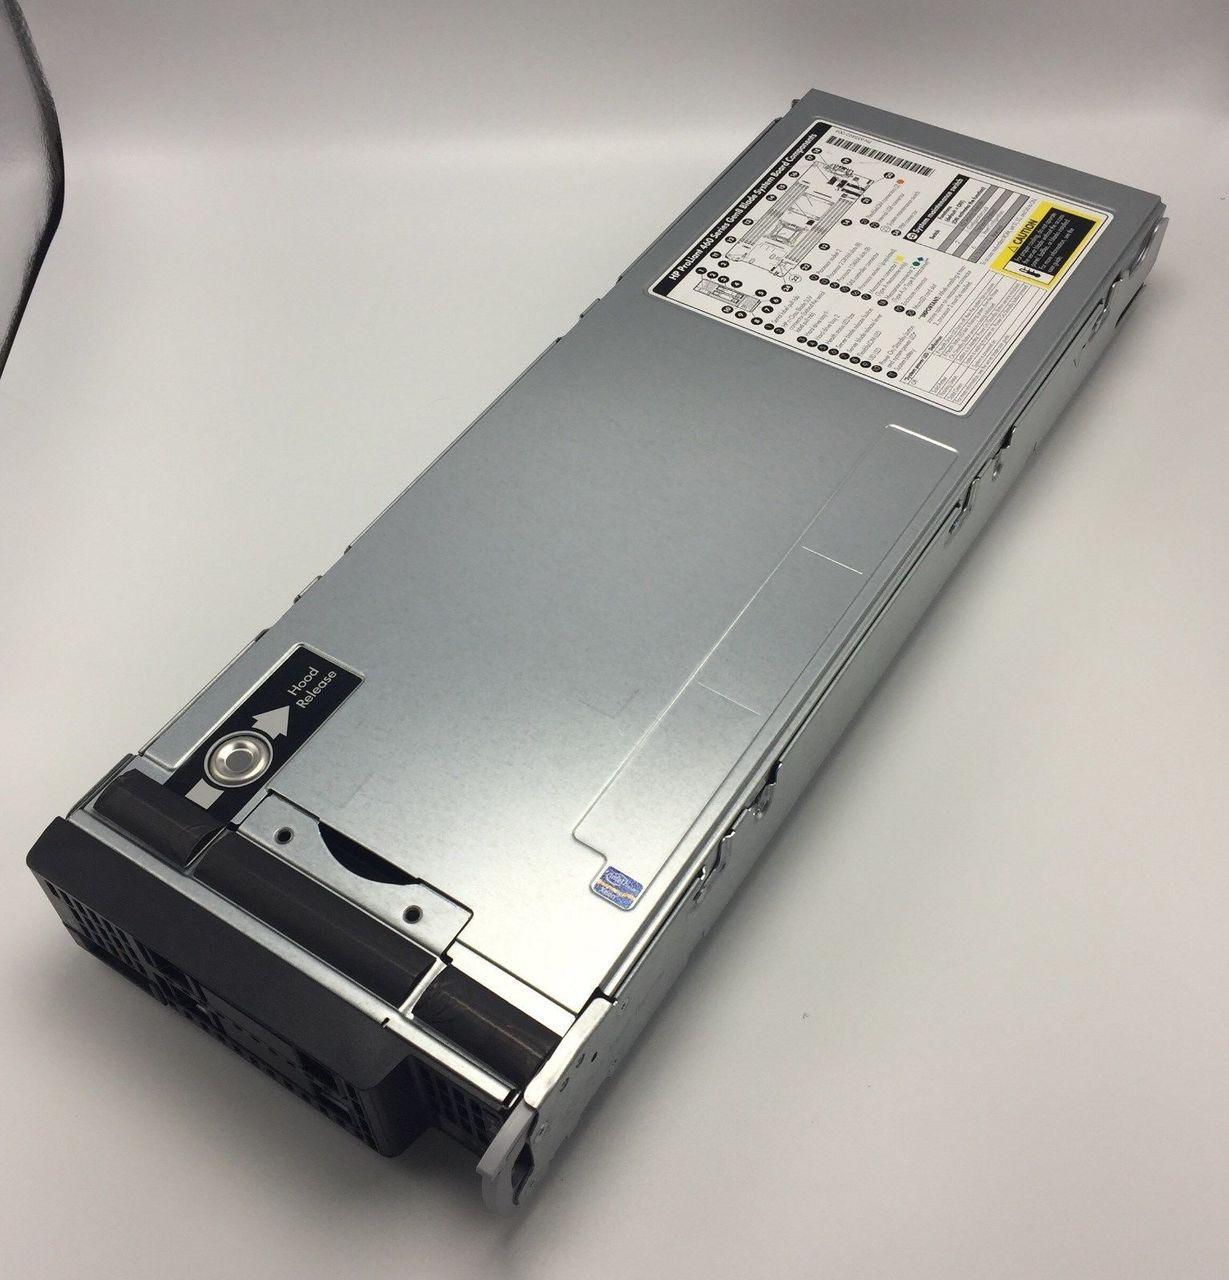 HP 724082-B21 BL460C G8 2x E5-2670v2 2.5GHZ 10C 64GB P220i/512 FBWC 534FLB